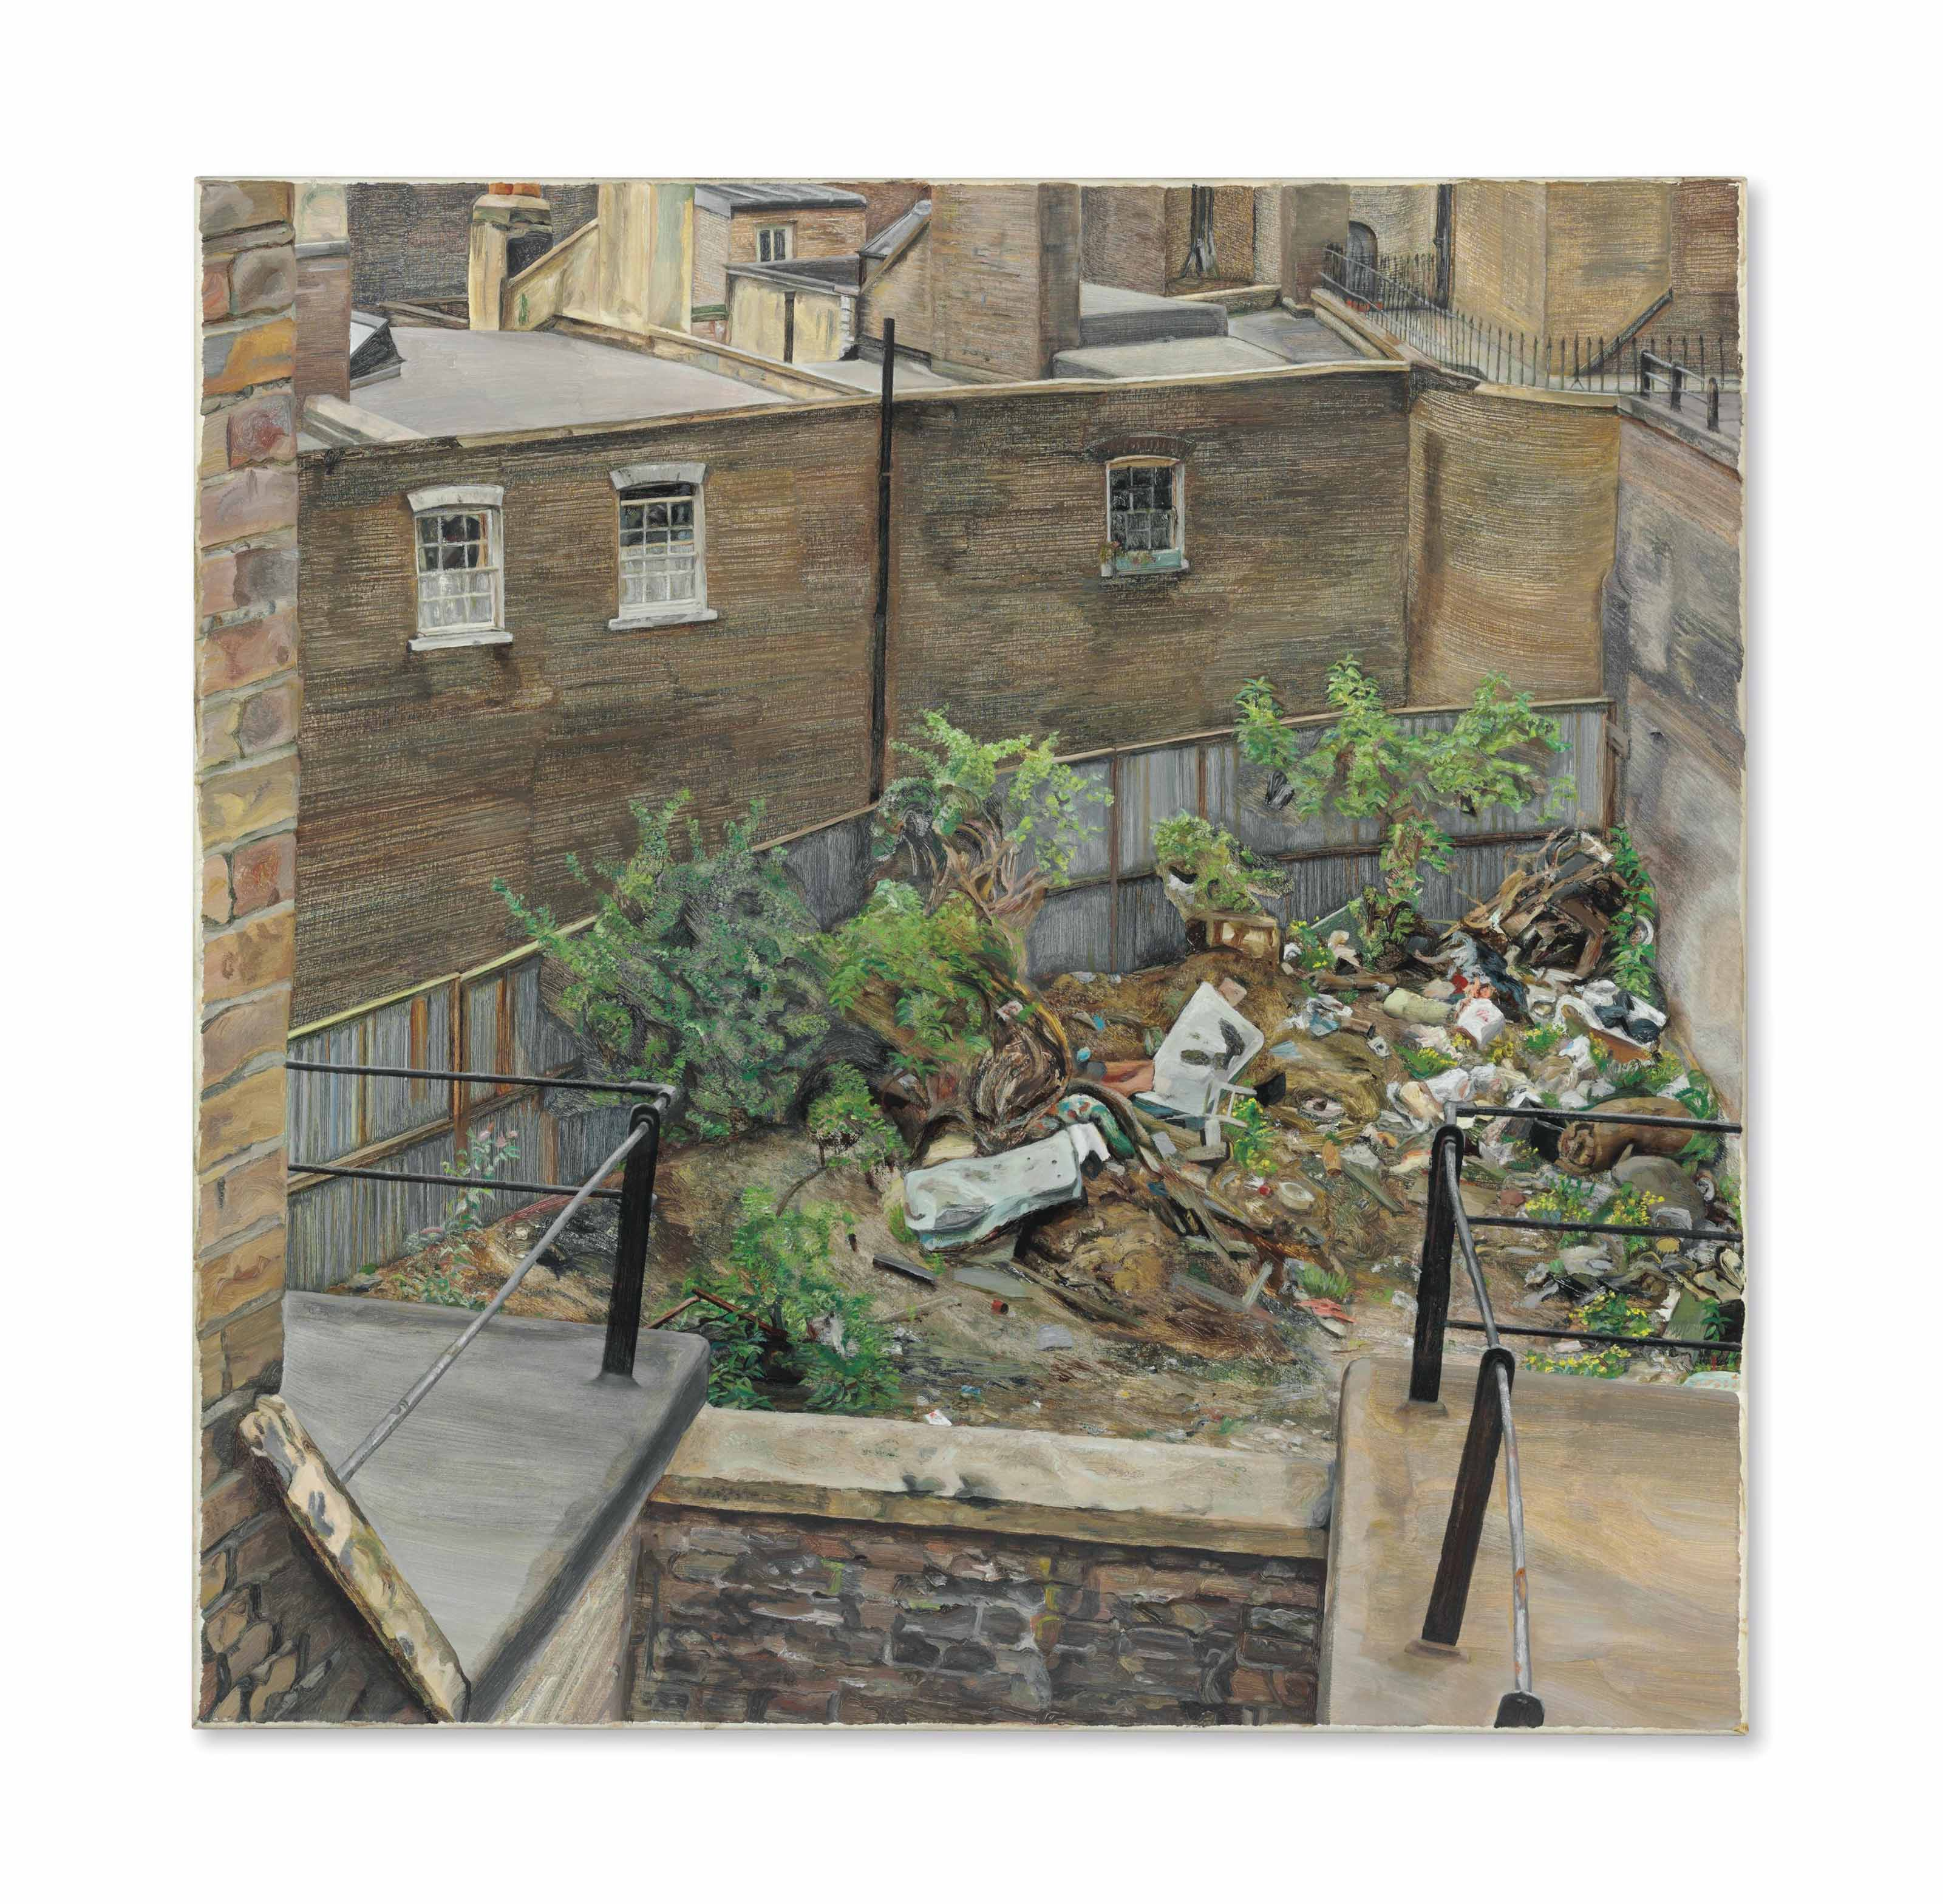 Audio: Lucian Freud, Waste Ground, Paddington